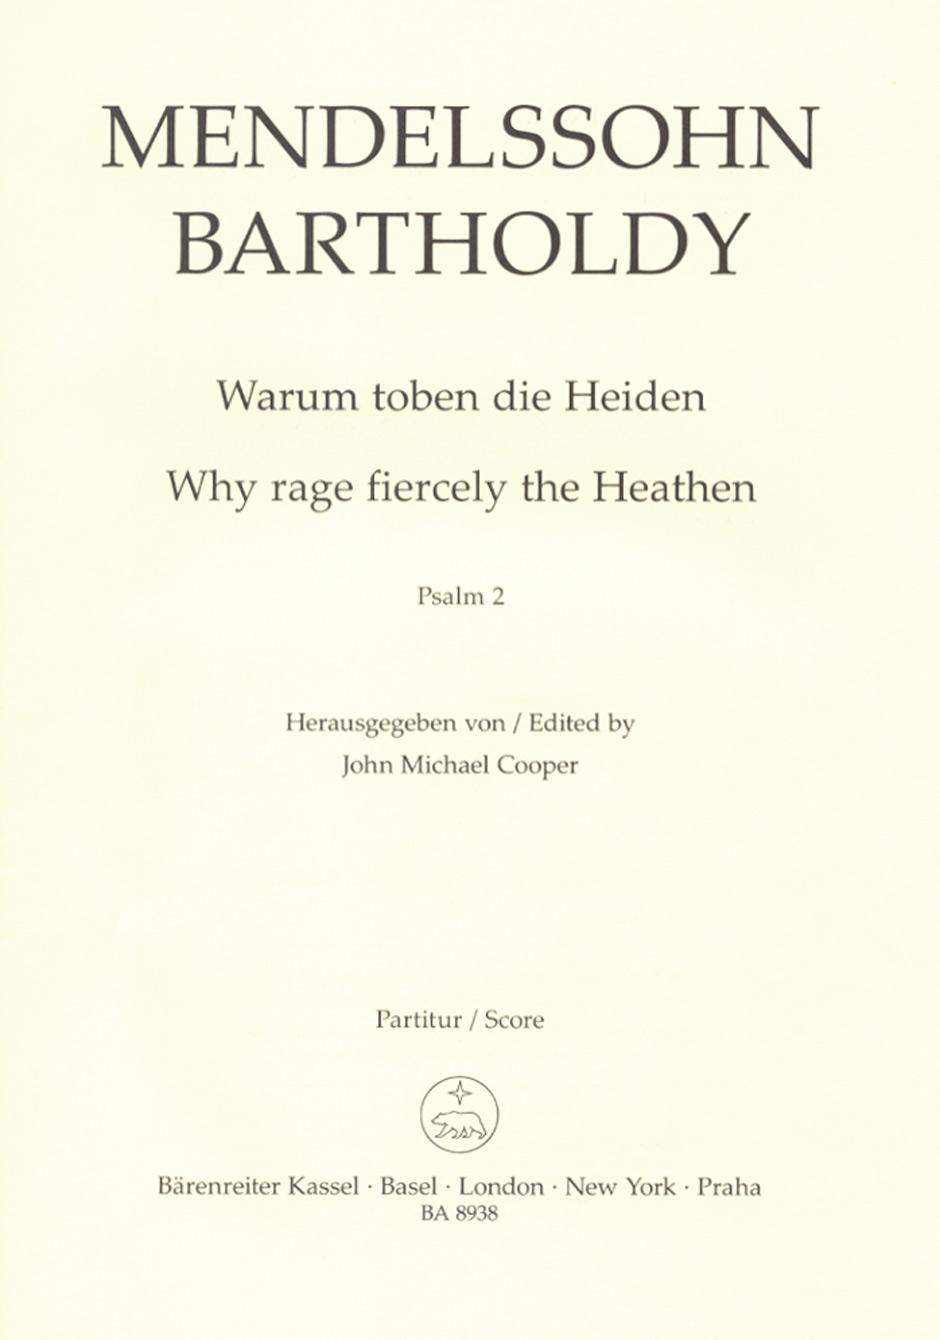 Felix Mendelssohn Bartholdy: Psalm 2 Why Rage Fiercely The Heathen Op.78: Vocal: